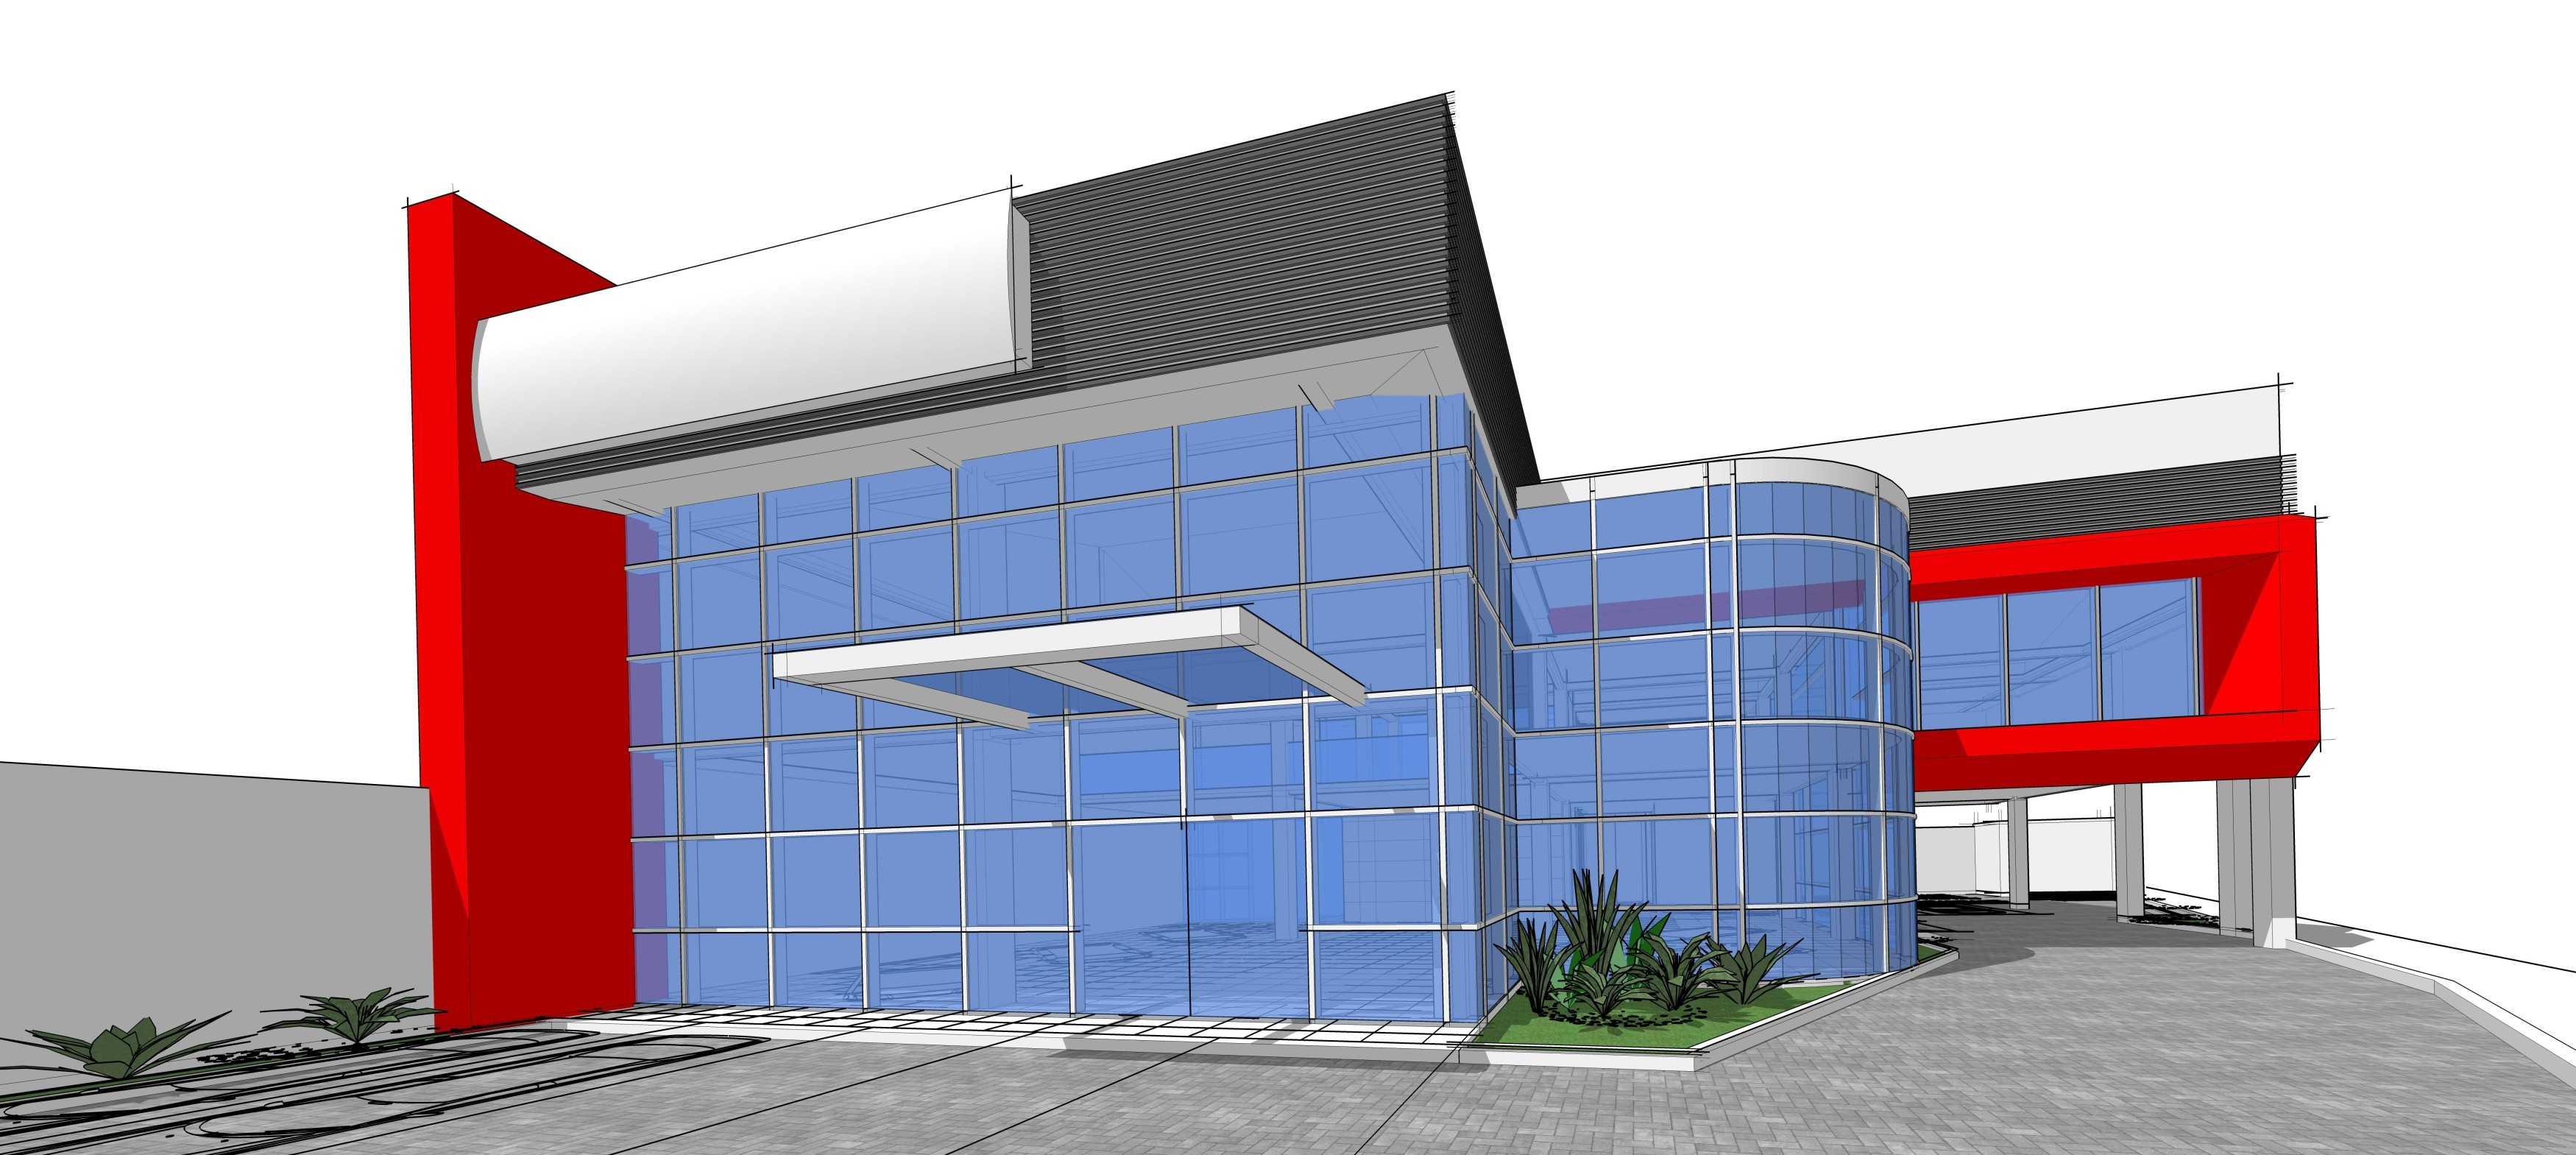 Gubah Ruang Studio Suzuki Njs Showroom Bandung, Kota Bandung, Jawa Barat, Indonesia Bandung, Kota Bandung, Jawa Barat, Indonesia Exterior View Modern  50846